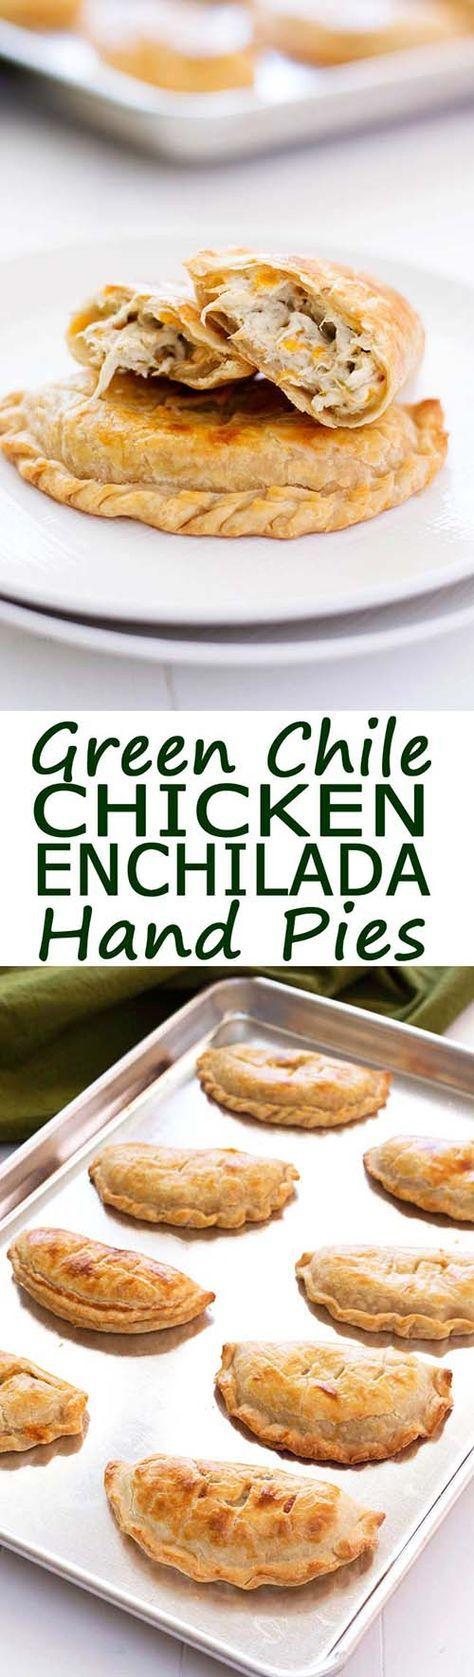 Green Chile Chicken Enchilada Hand Pies! Flavorful filling of cream cheese, chicken and green chiles similar to enchiladas suizas or enchiladas verdes!   Kitchen Gidget